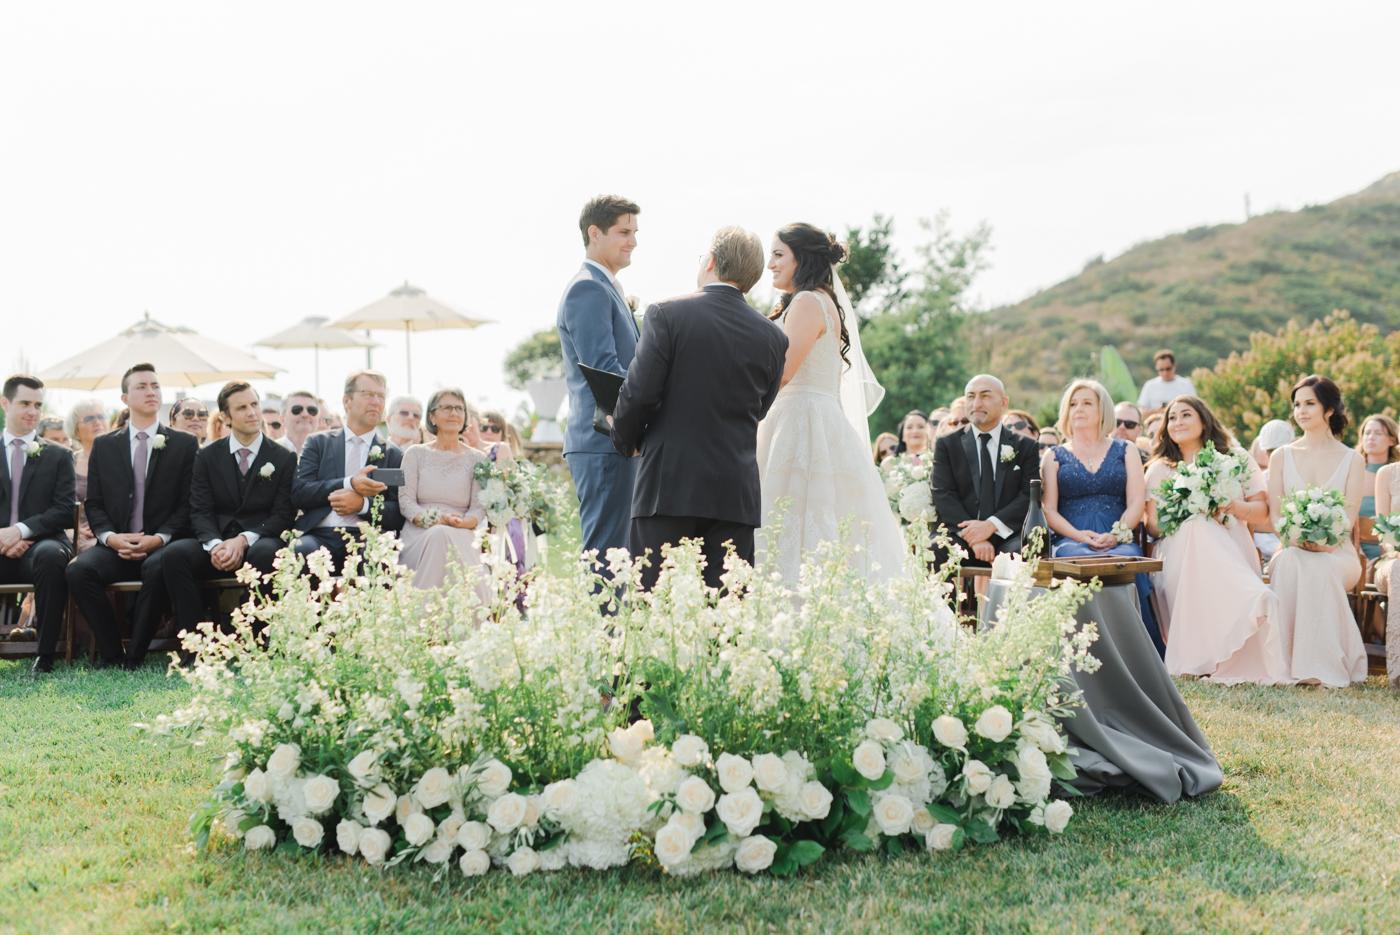 AKP_S&F_Malibu_Wedding_Fine_Art_Photography_Los_Angeles-19_ceremony.jpg